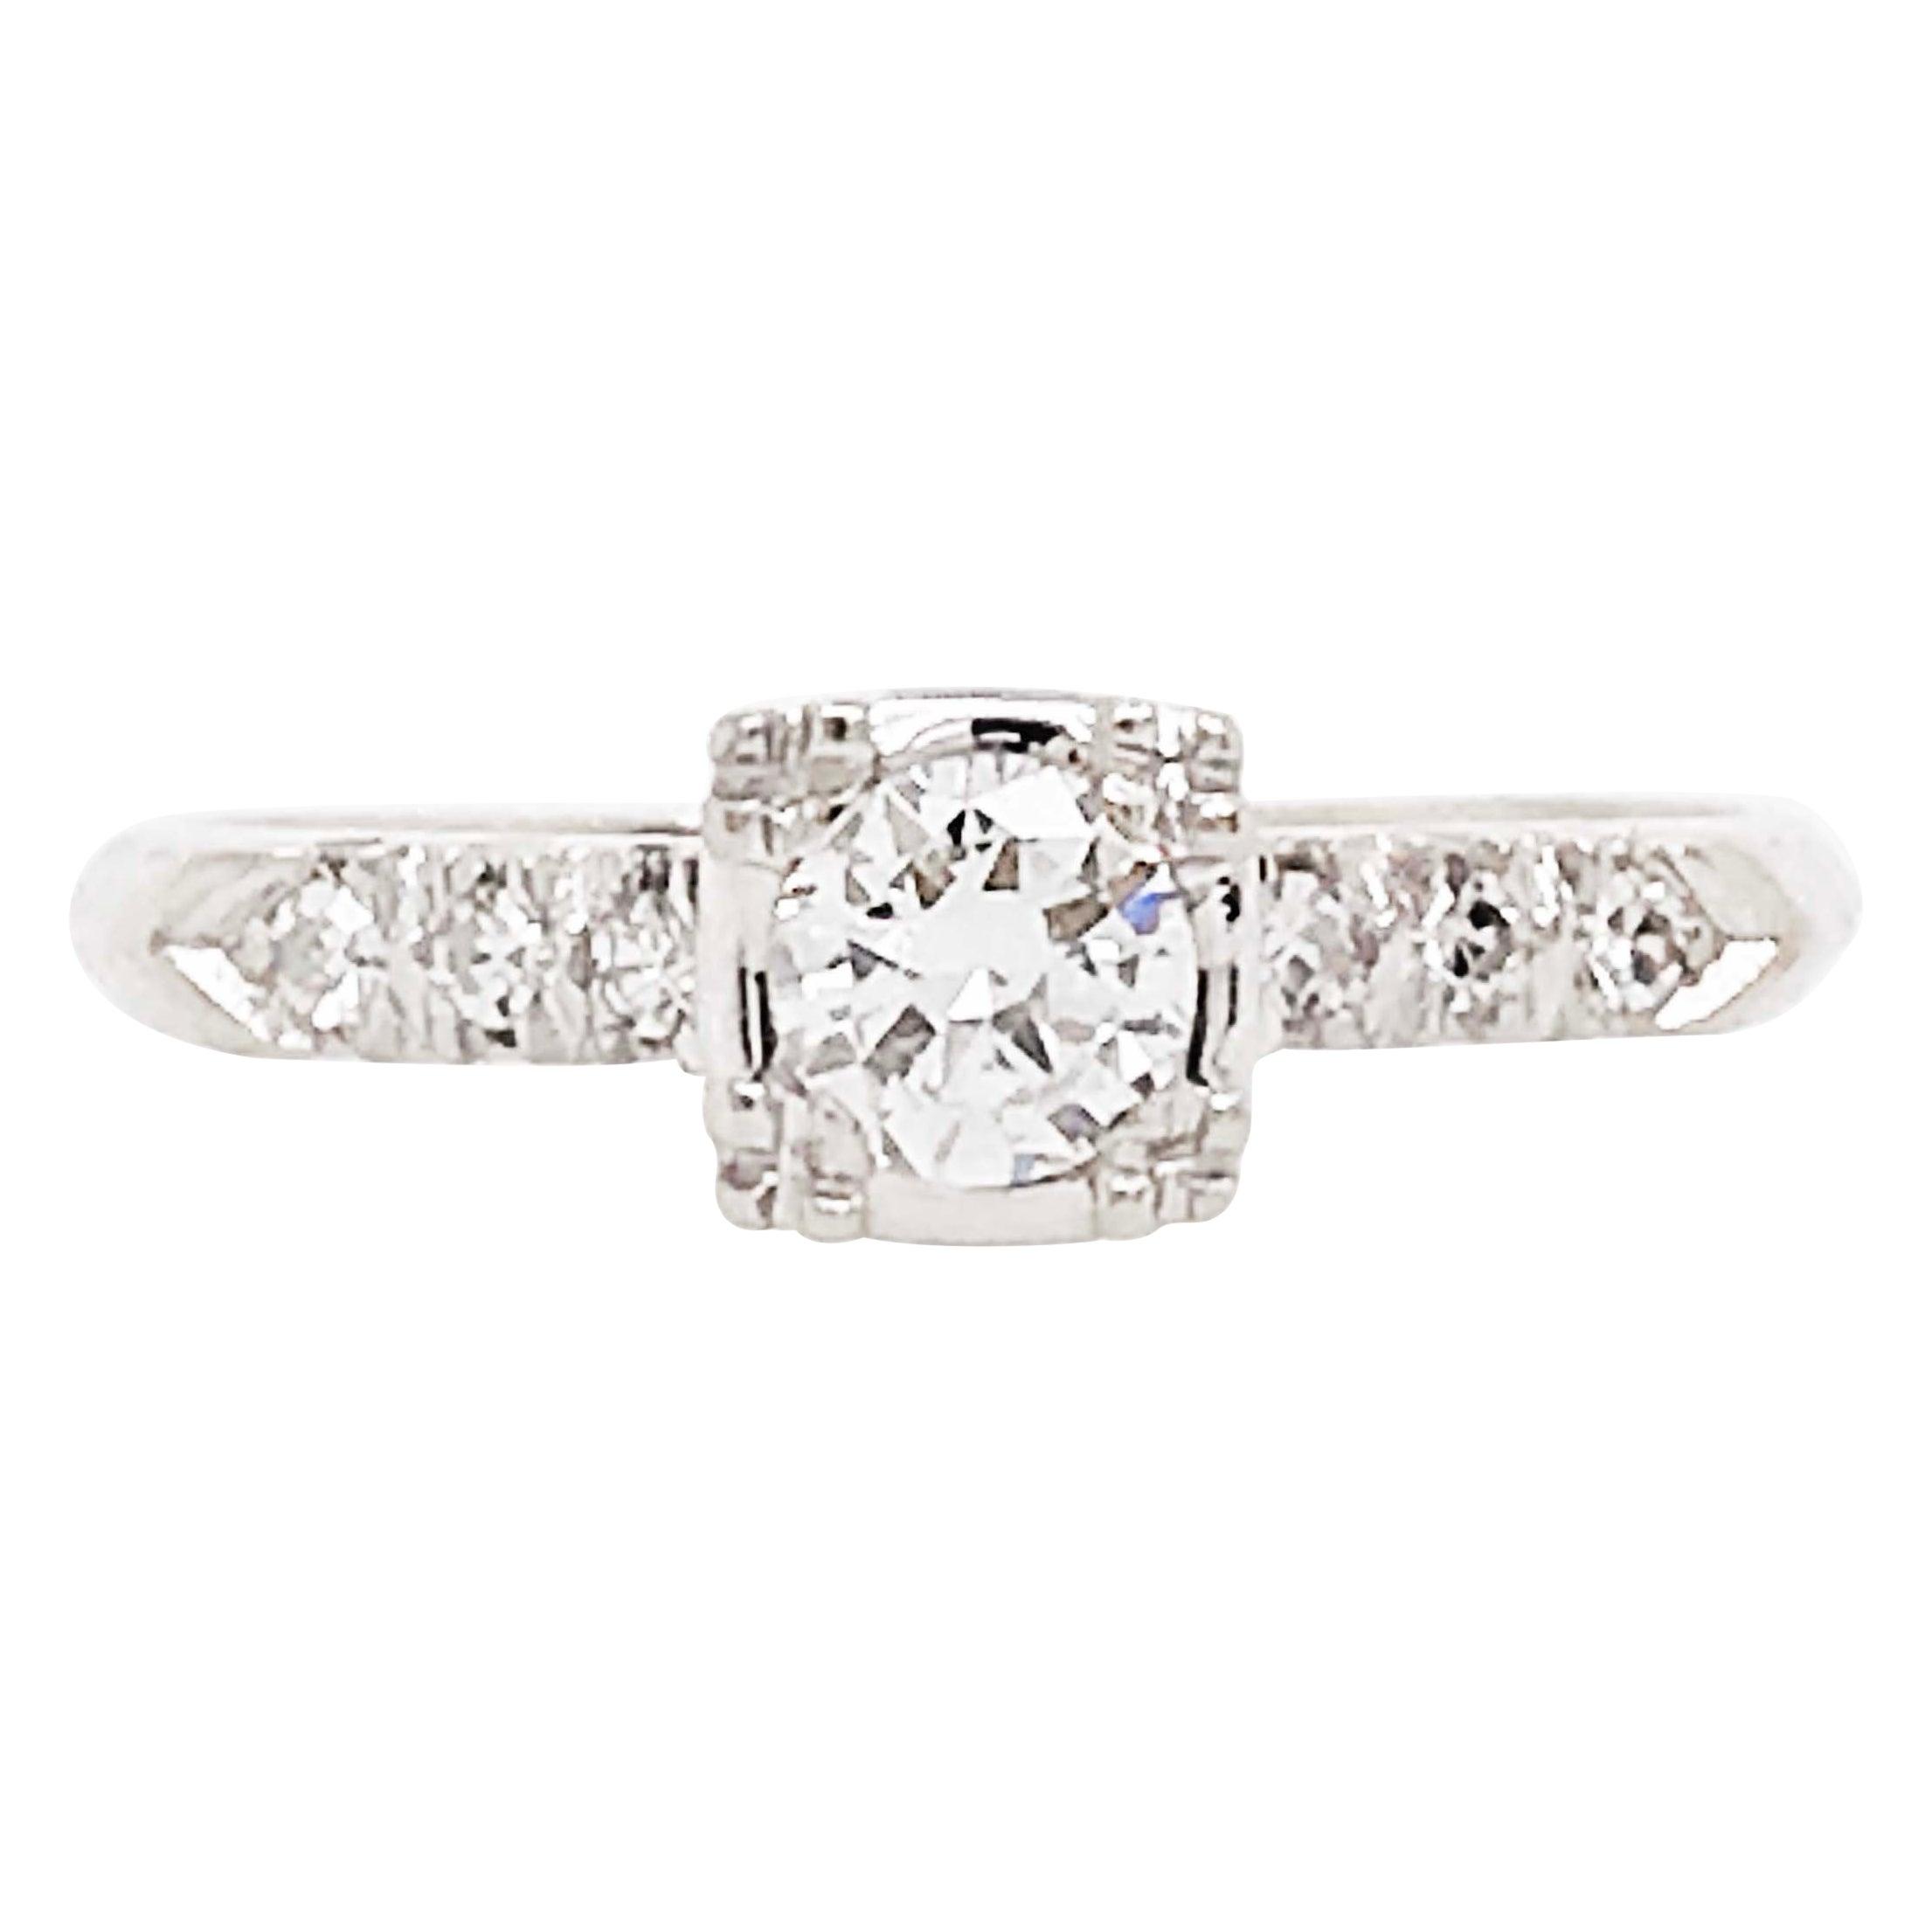 Platinum Diamond Ring, 0.50 Carat Old European Diamond and Side Diamond Estate